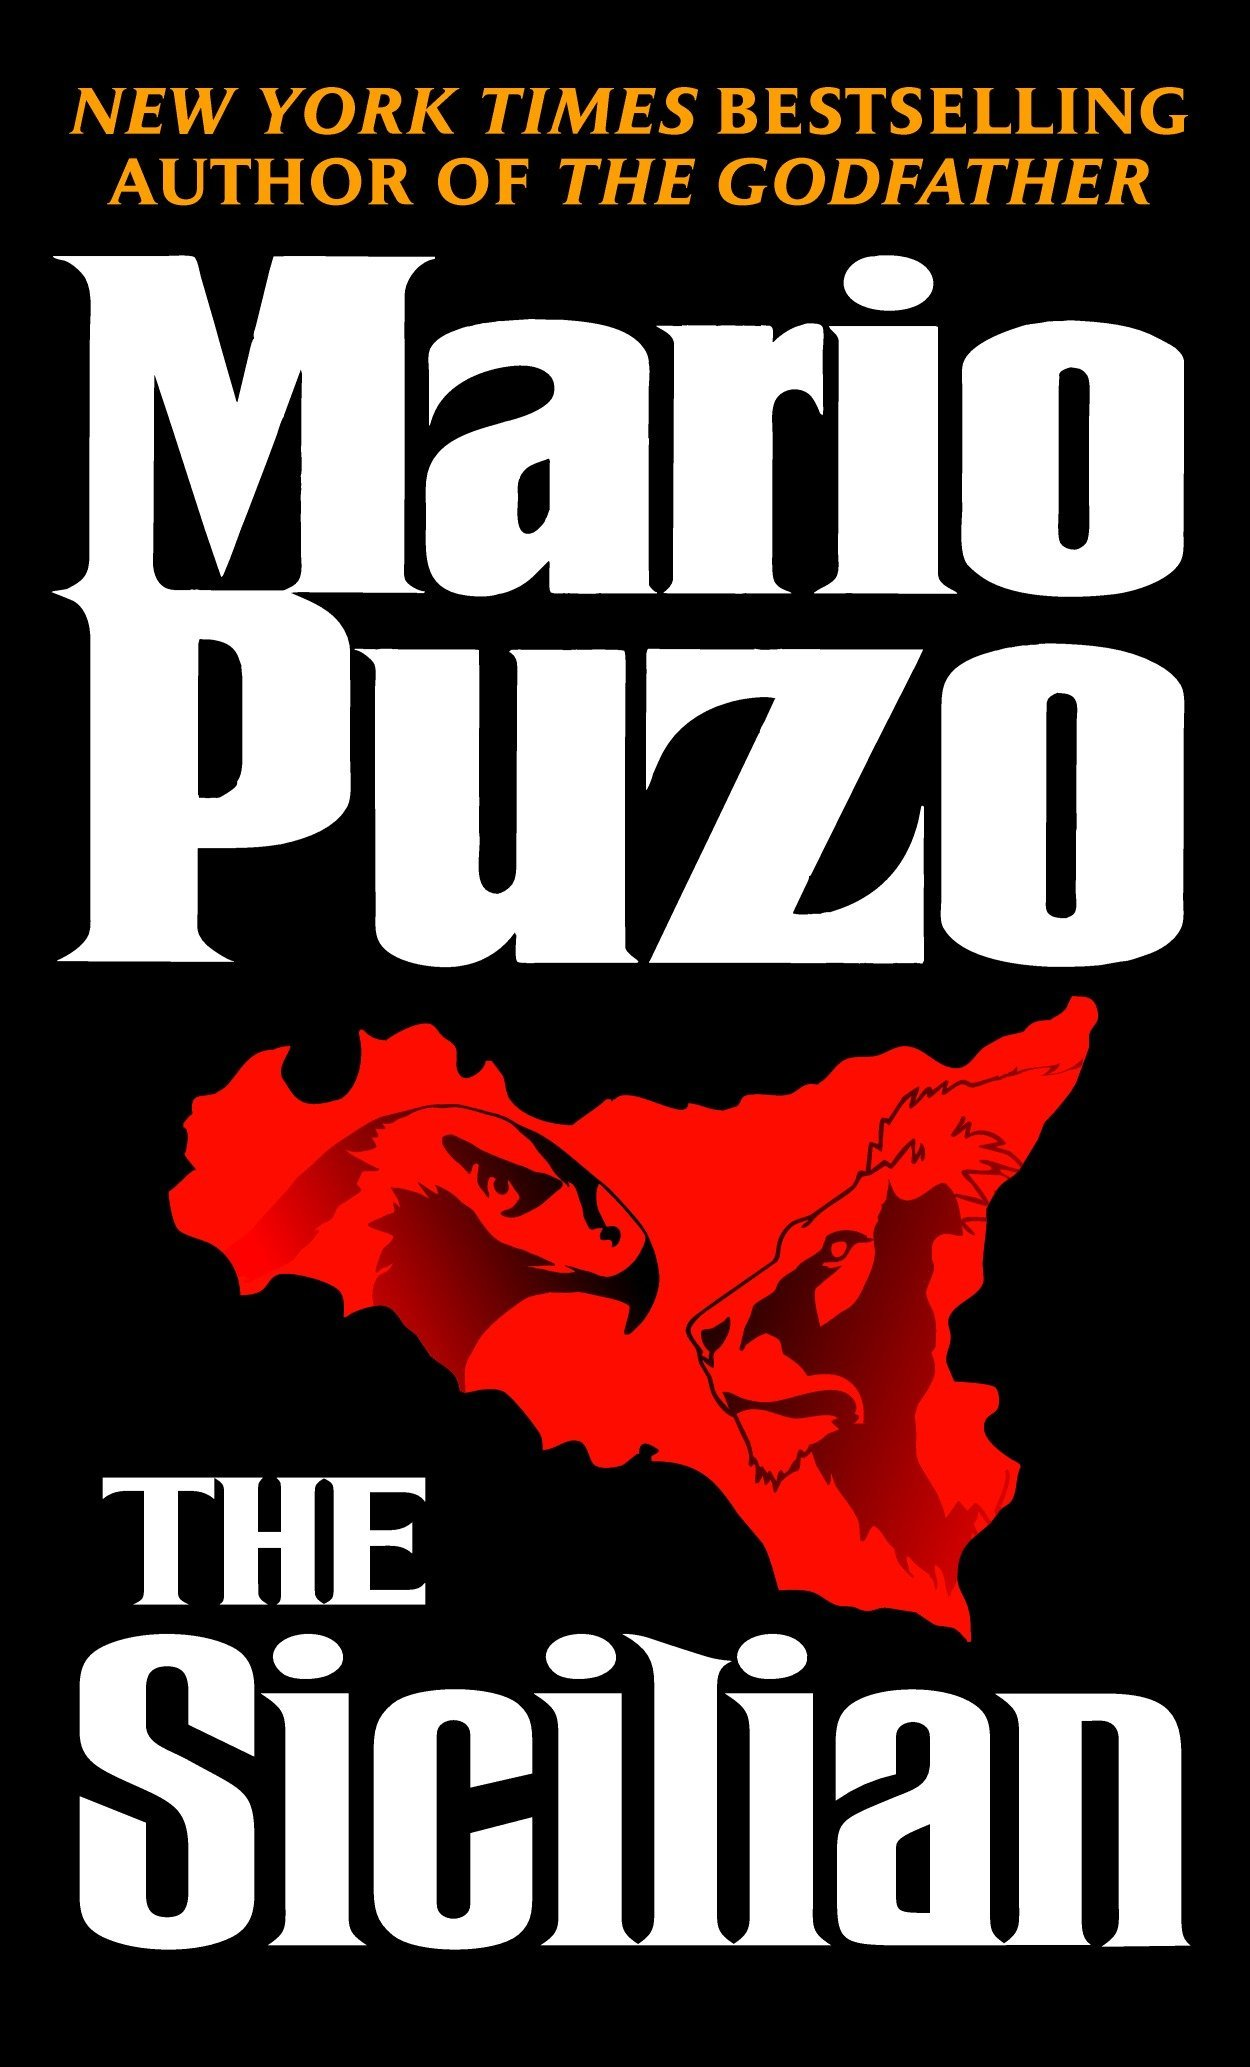 The Sicilian: A Novel ebook